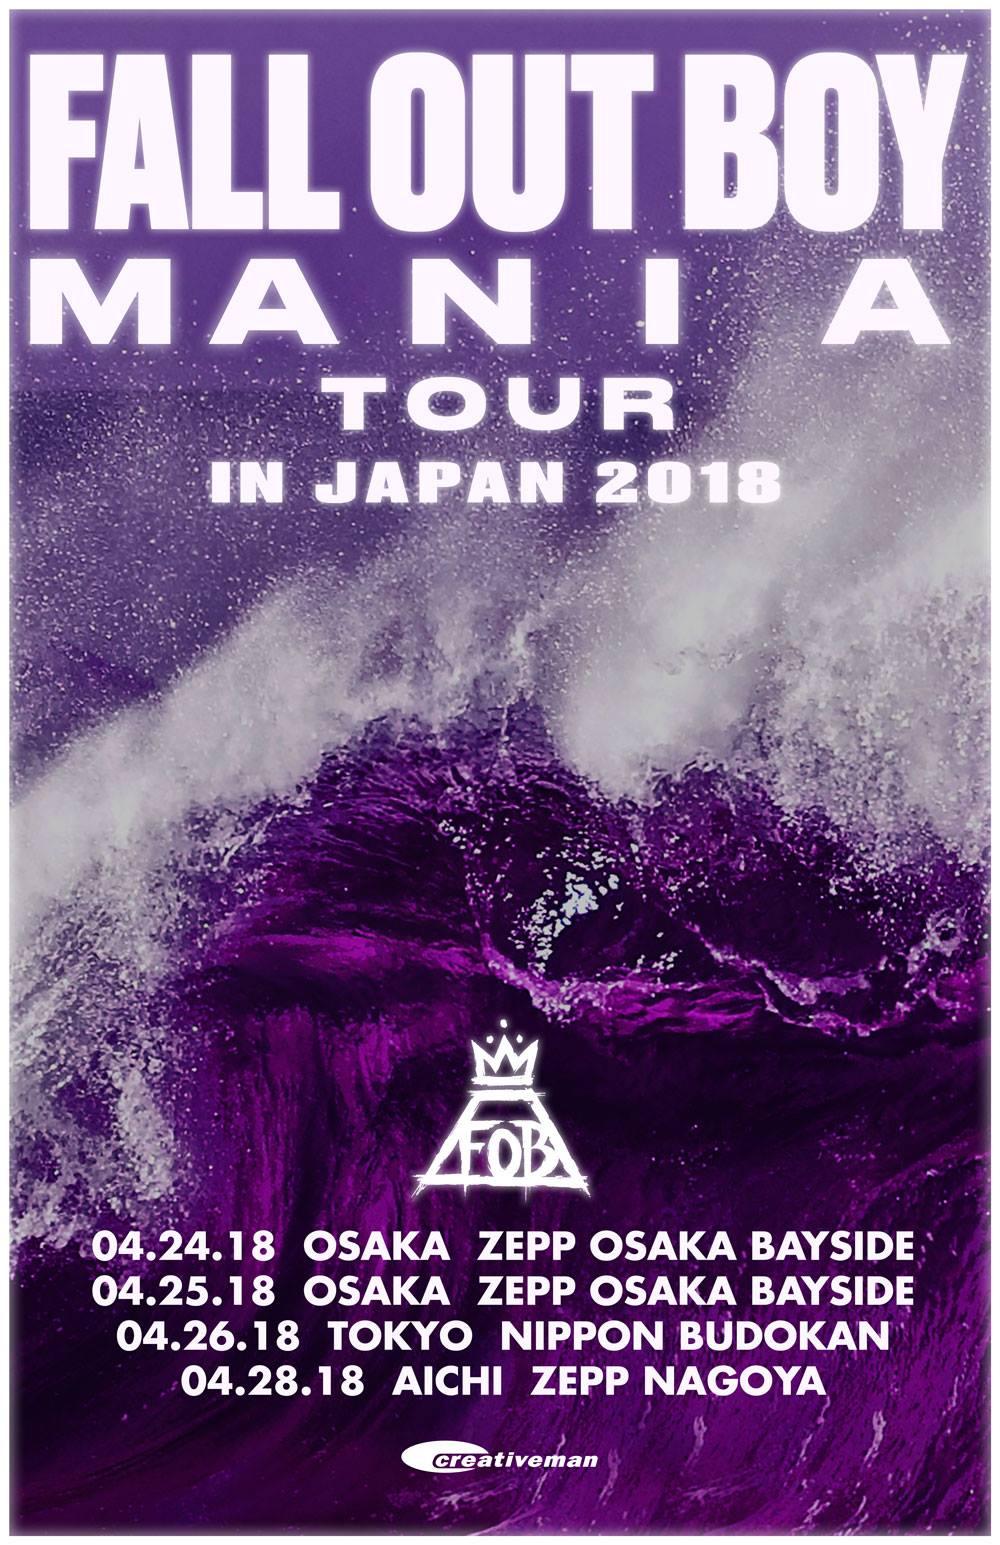 The M A  N   I    A Tour shows in April just went on sale, Japan! ��✨ https://t.co/h98ZG3IEMd https://t.co/VqFjw2OzZo